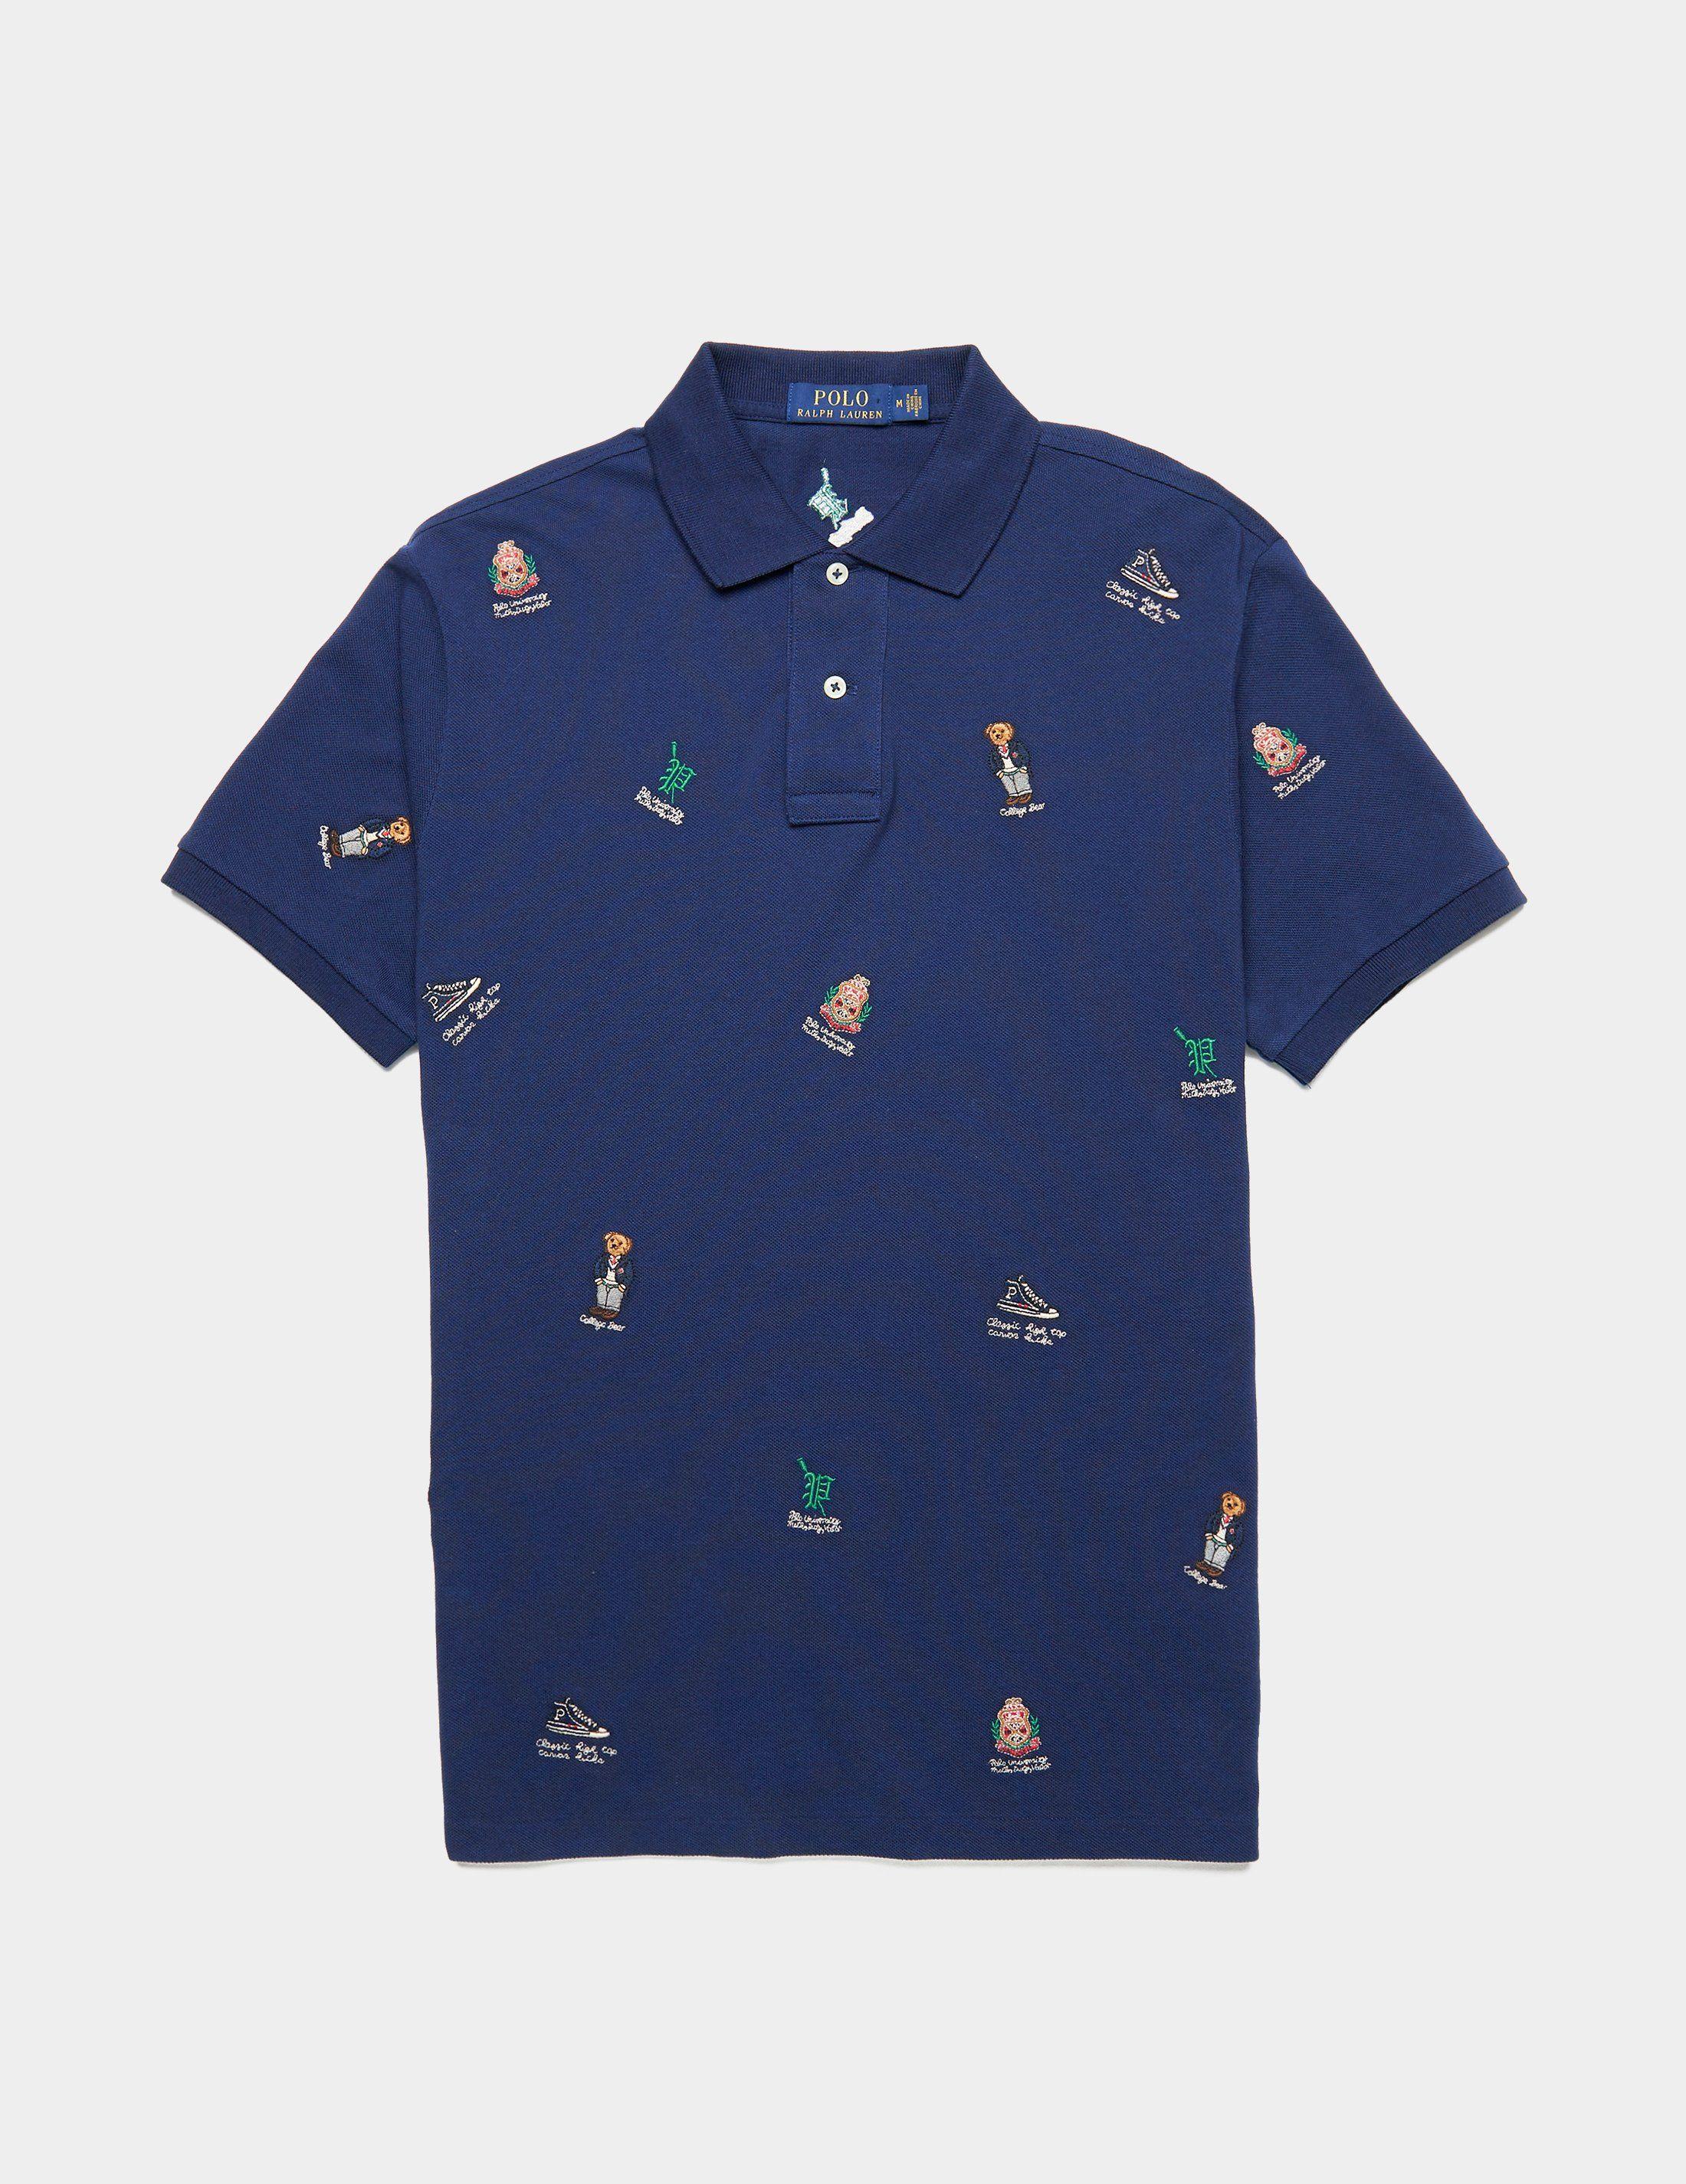 Polo Ralph Lauren Collage Short Sleeve Polo Shirt